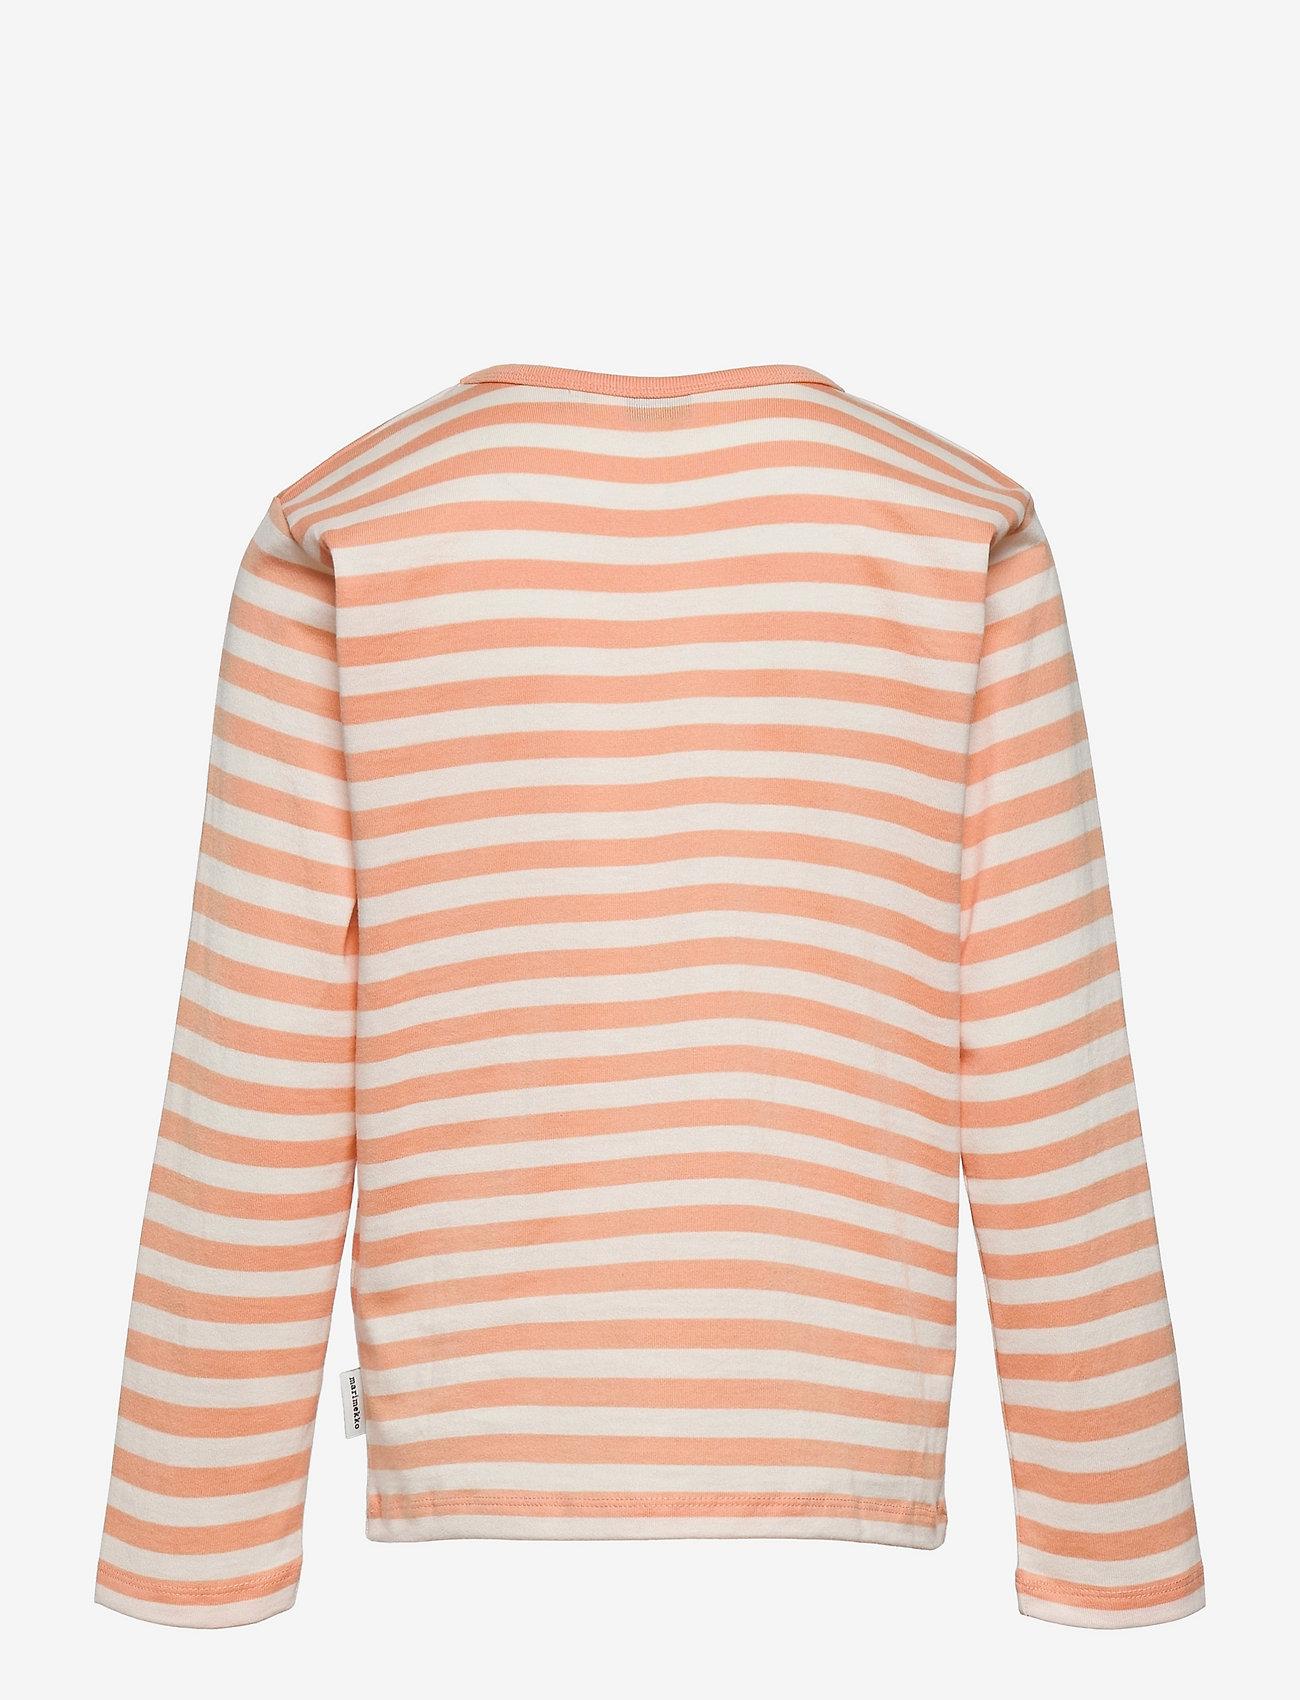 Marimekko - VEDE TASARAITA 2 - langærmede t-shirts - off white, light apricot, gold - 1